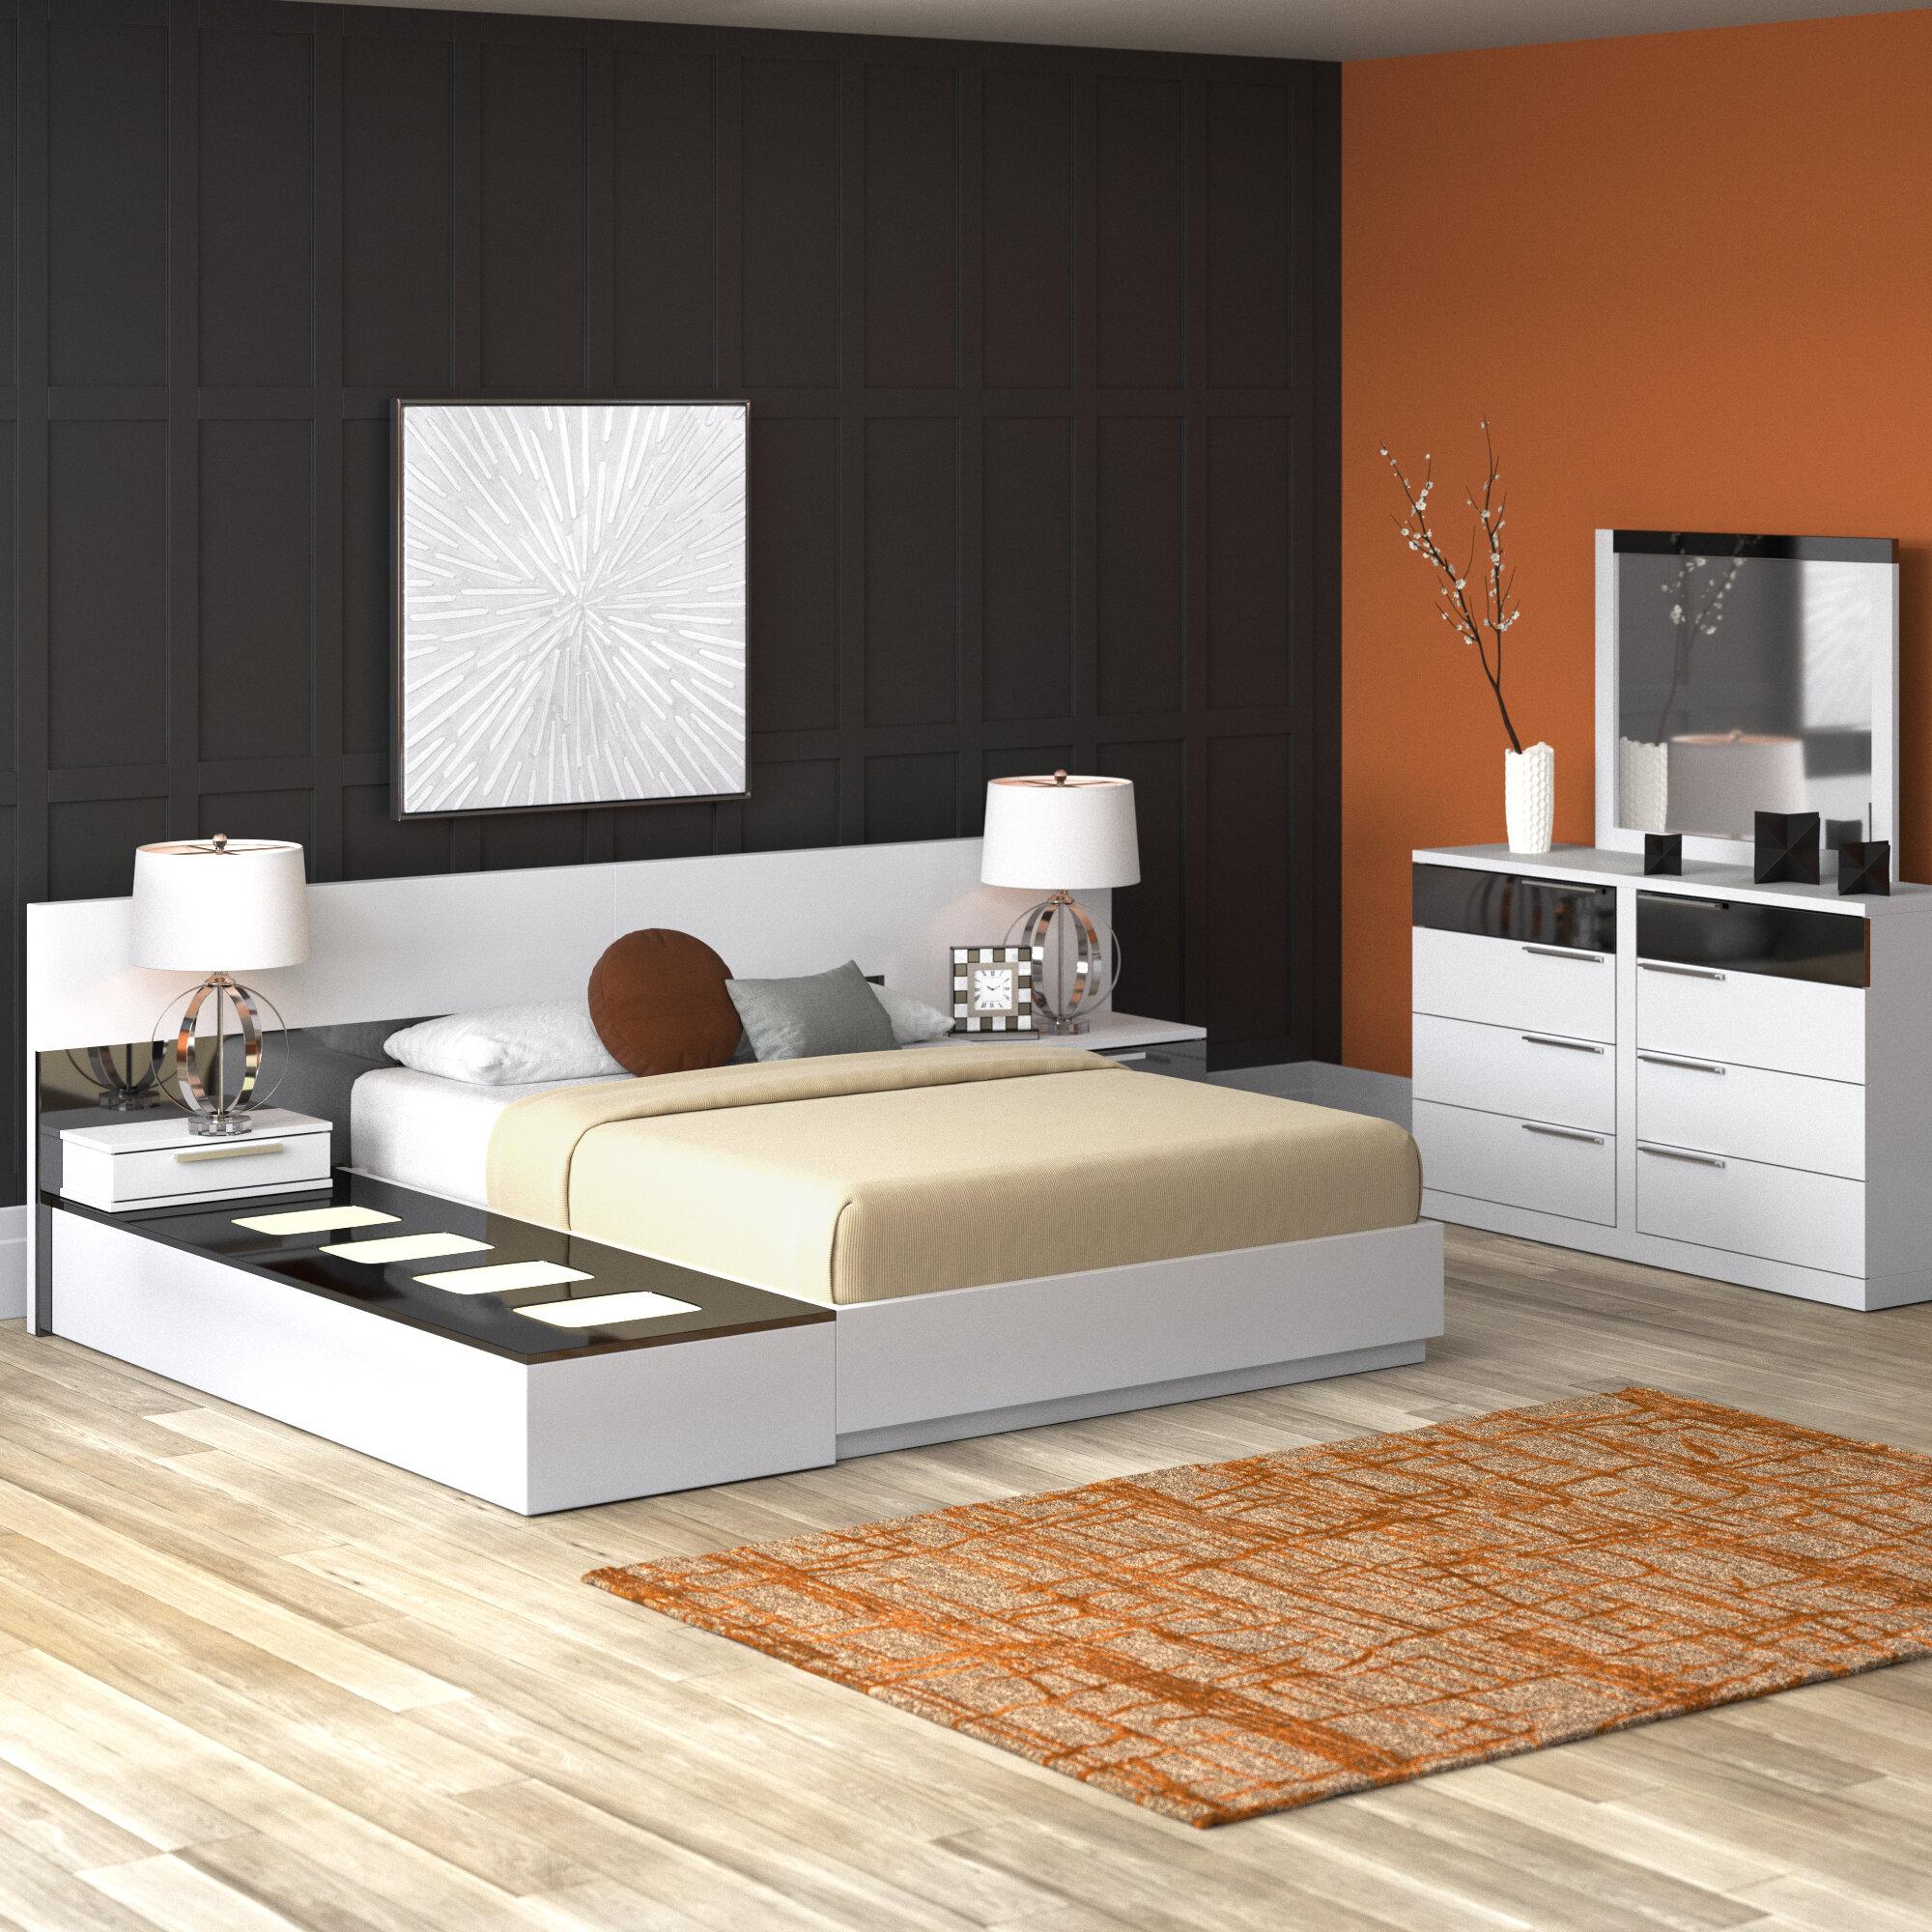 Poplar Bedroom Sets You Ll Love In 2021 Wayfair